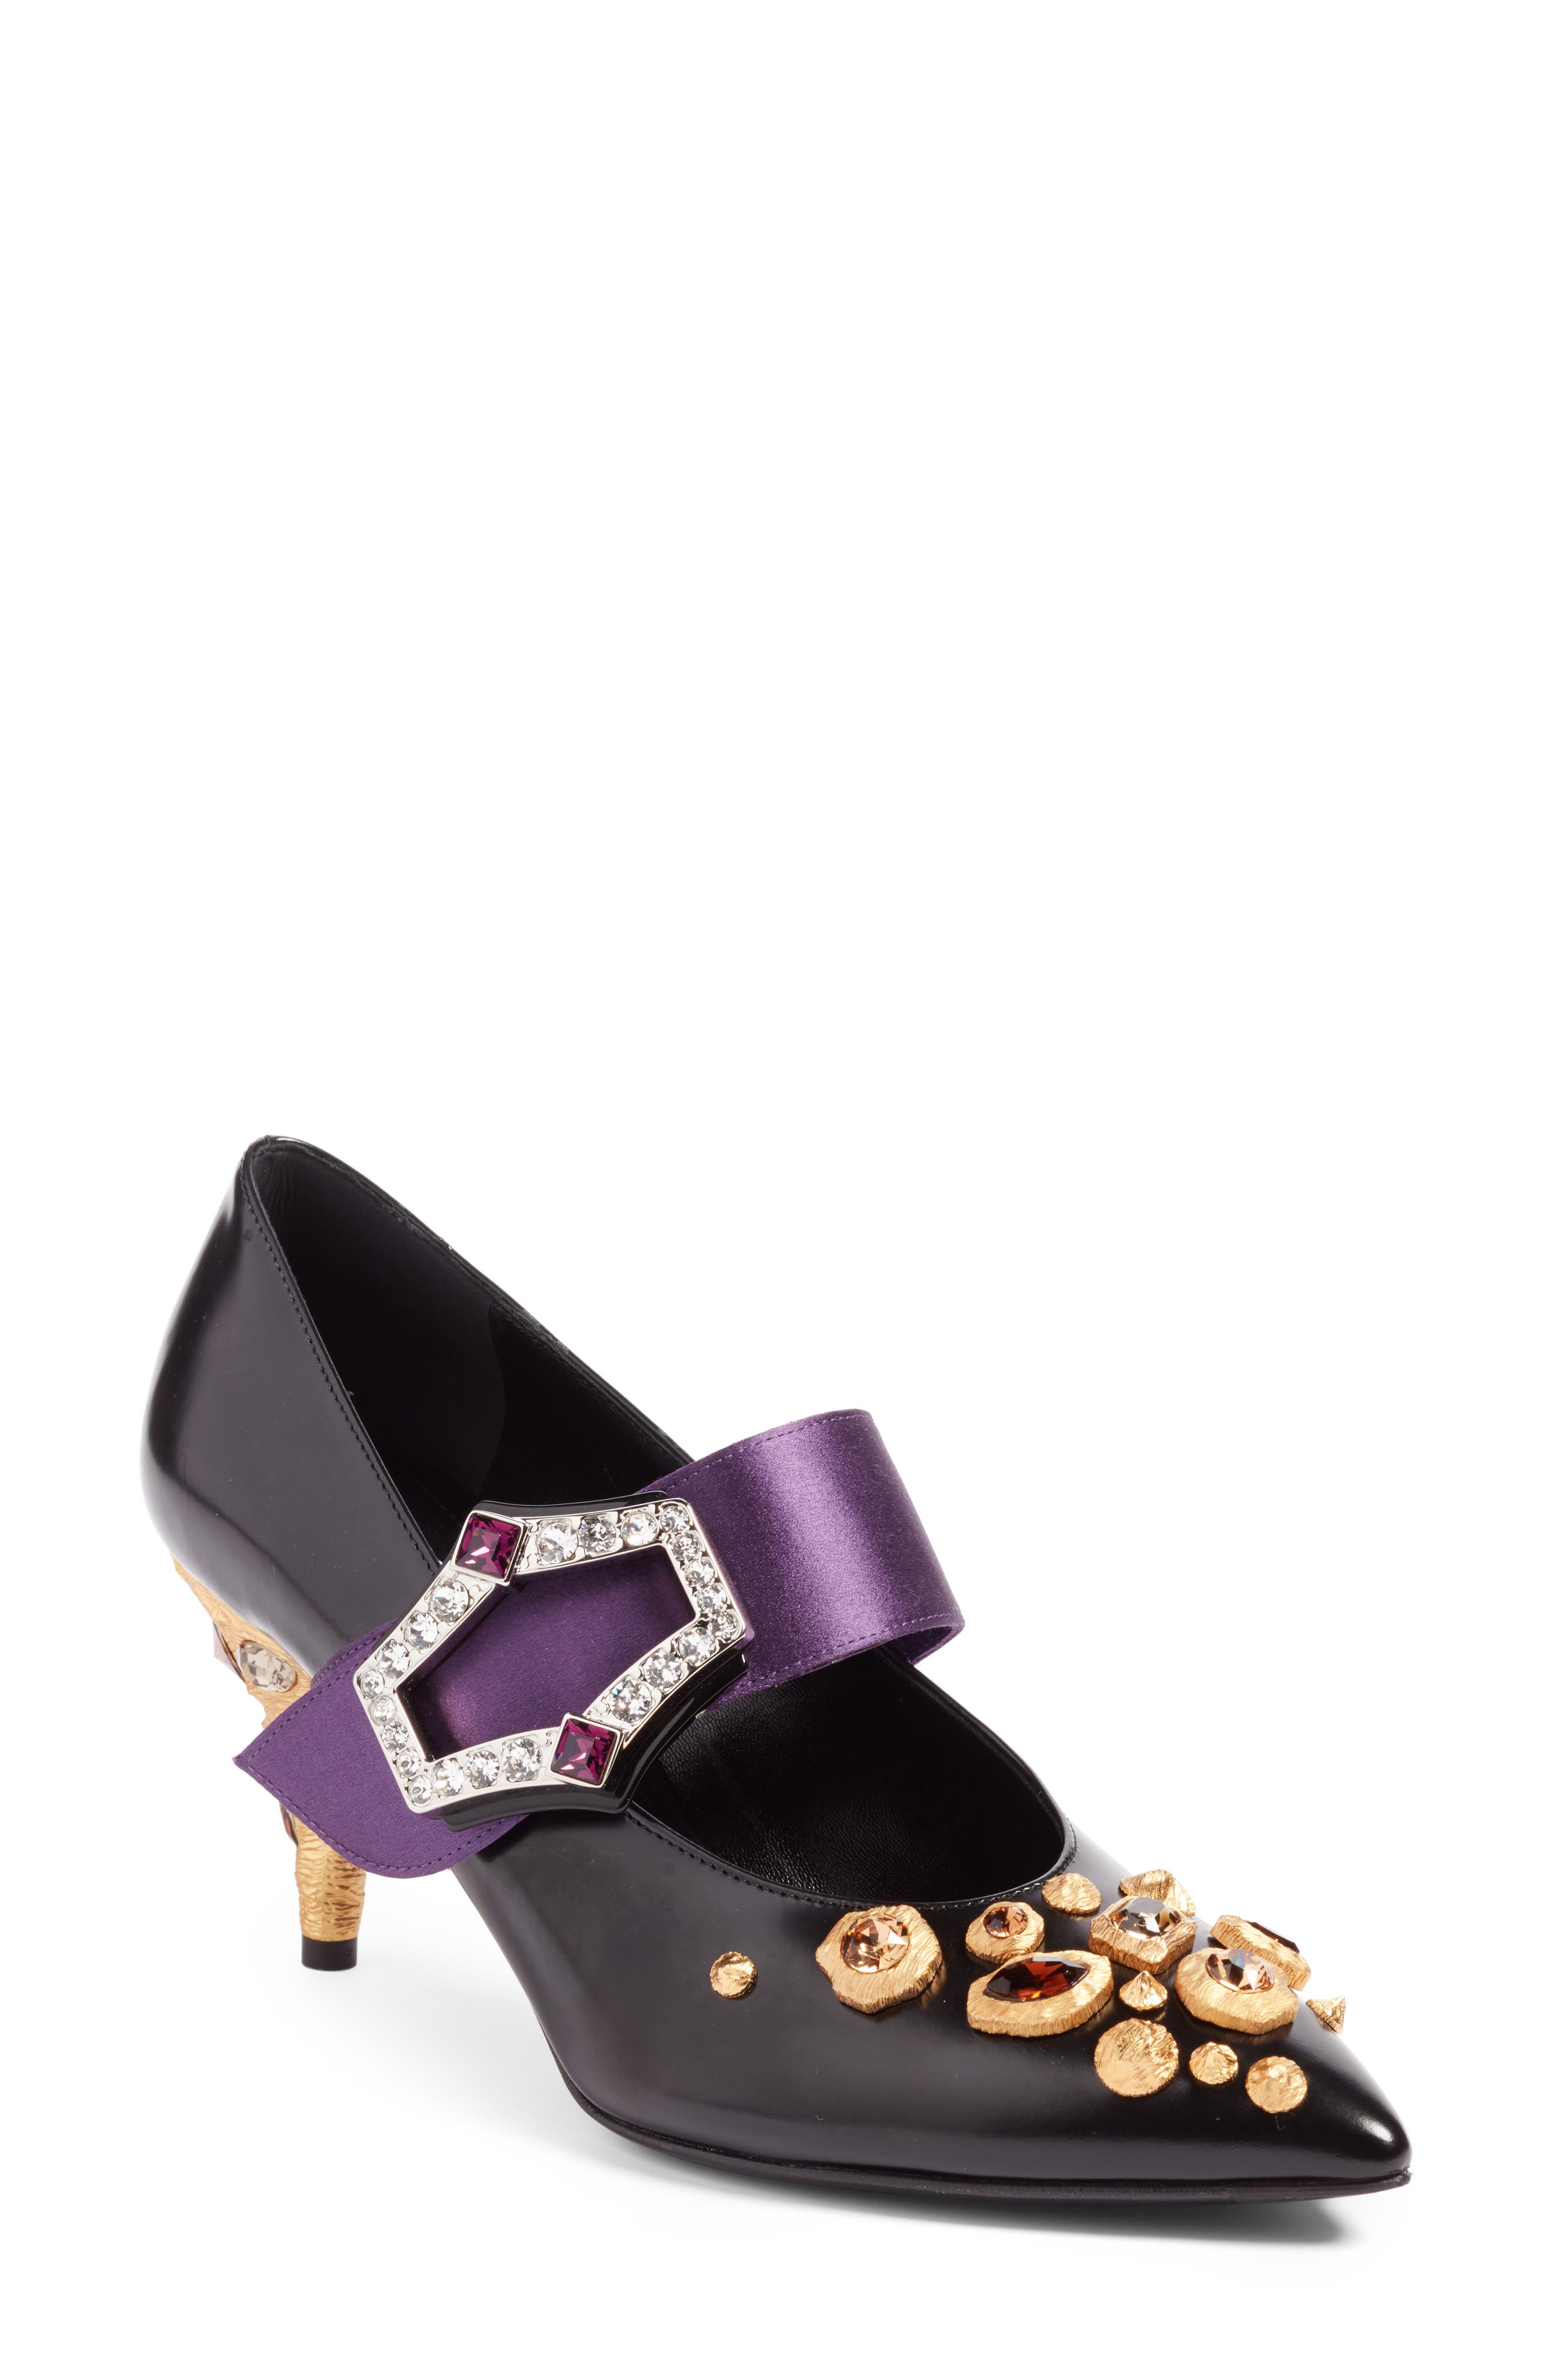 Jeweled Mary Jane Pump,                             Main thumbnail 1, color,                             Black/ Purple